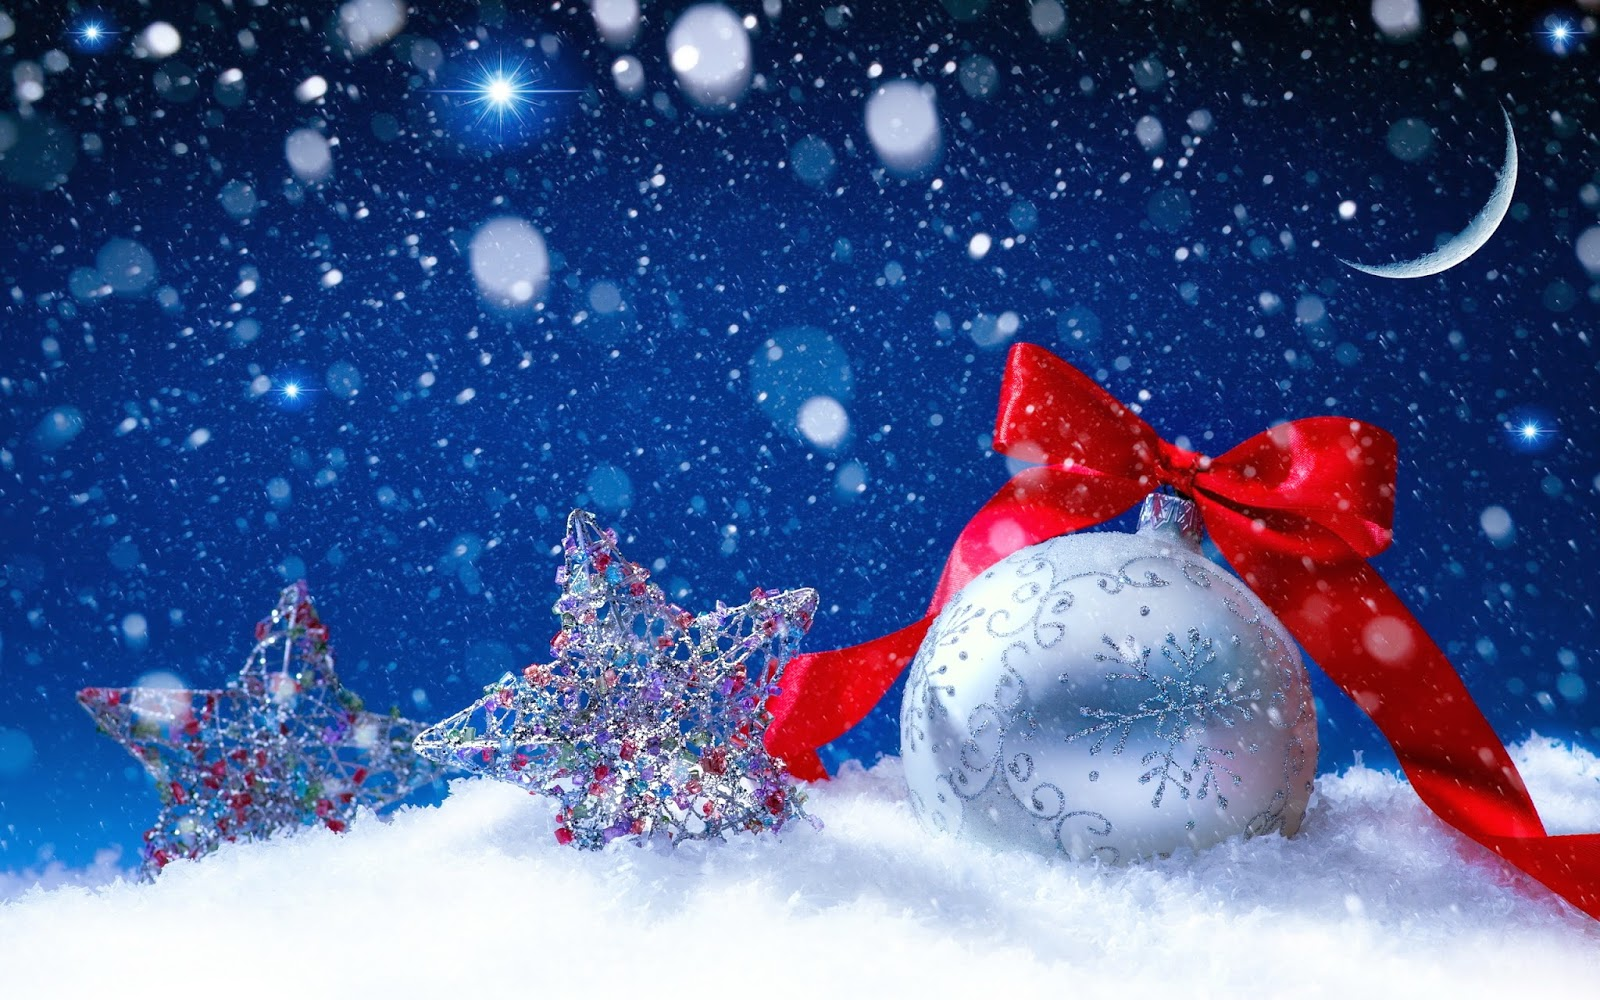 Golden tree wallpaper desktop wallpaper - Christmas Tree Baubles Decorations Beautiful Balls Designs